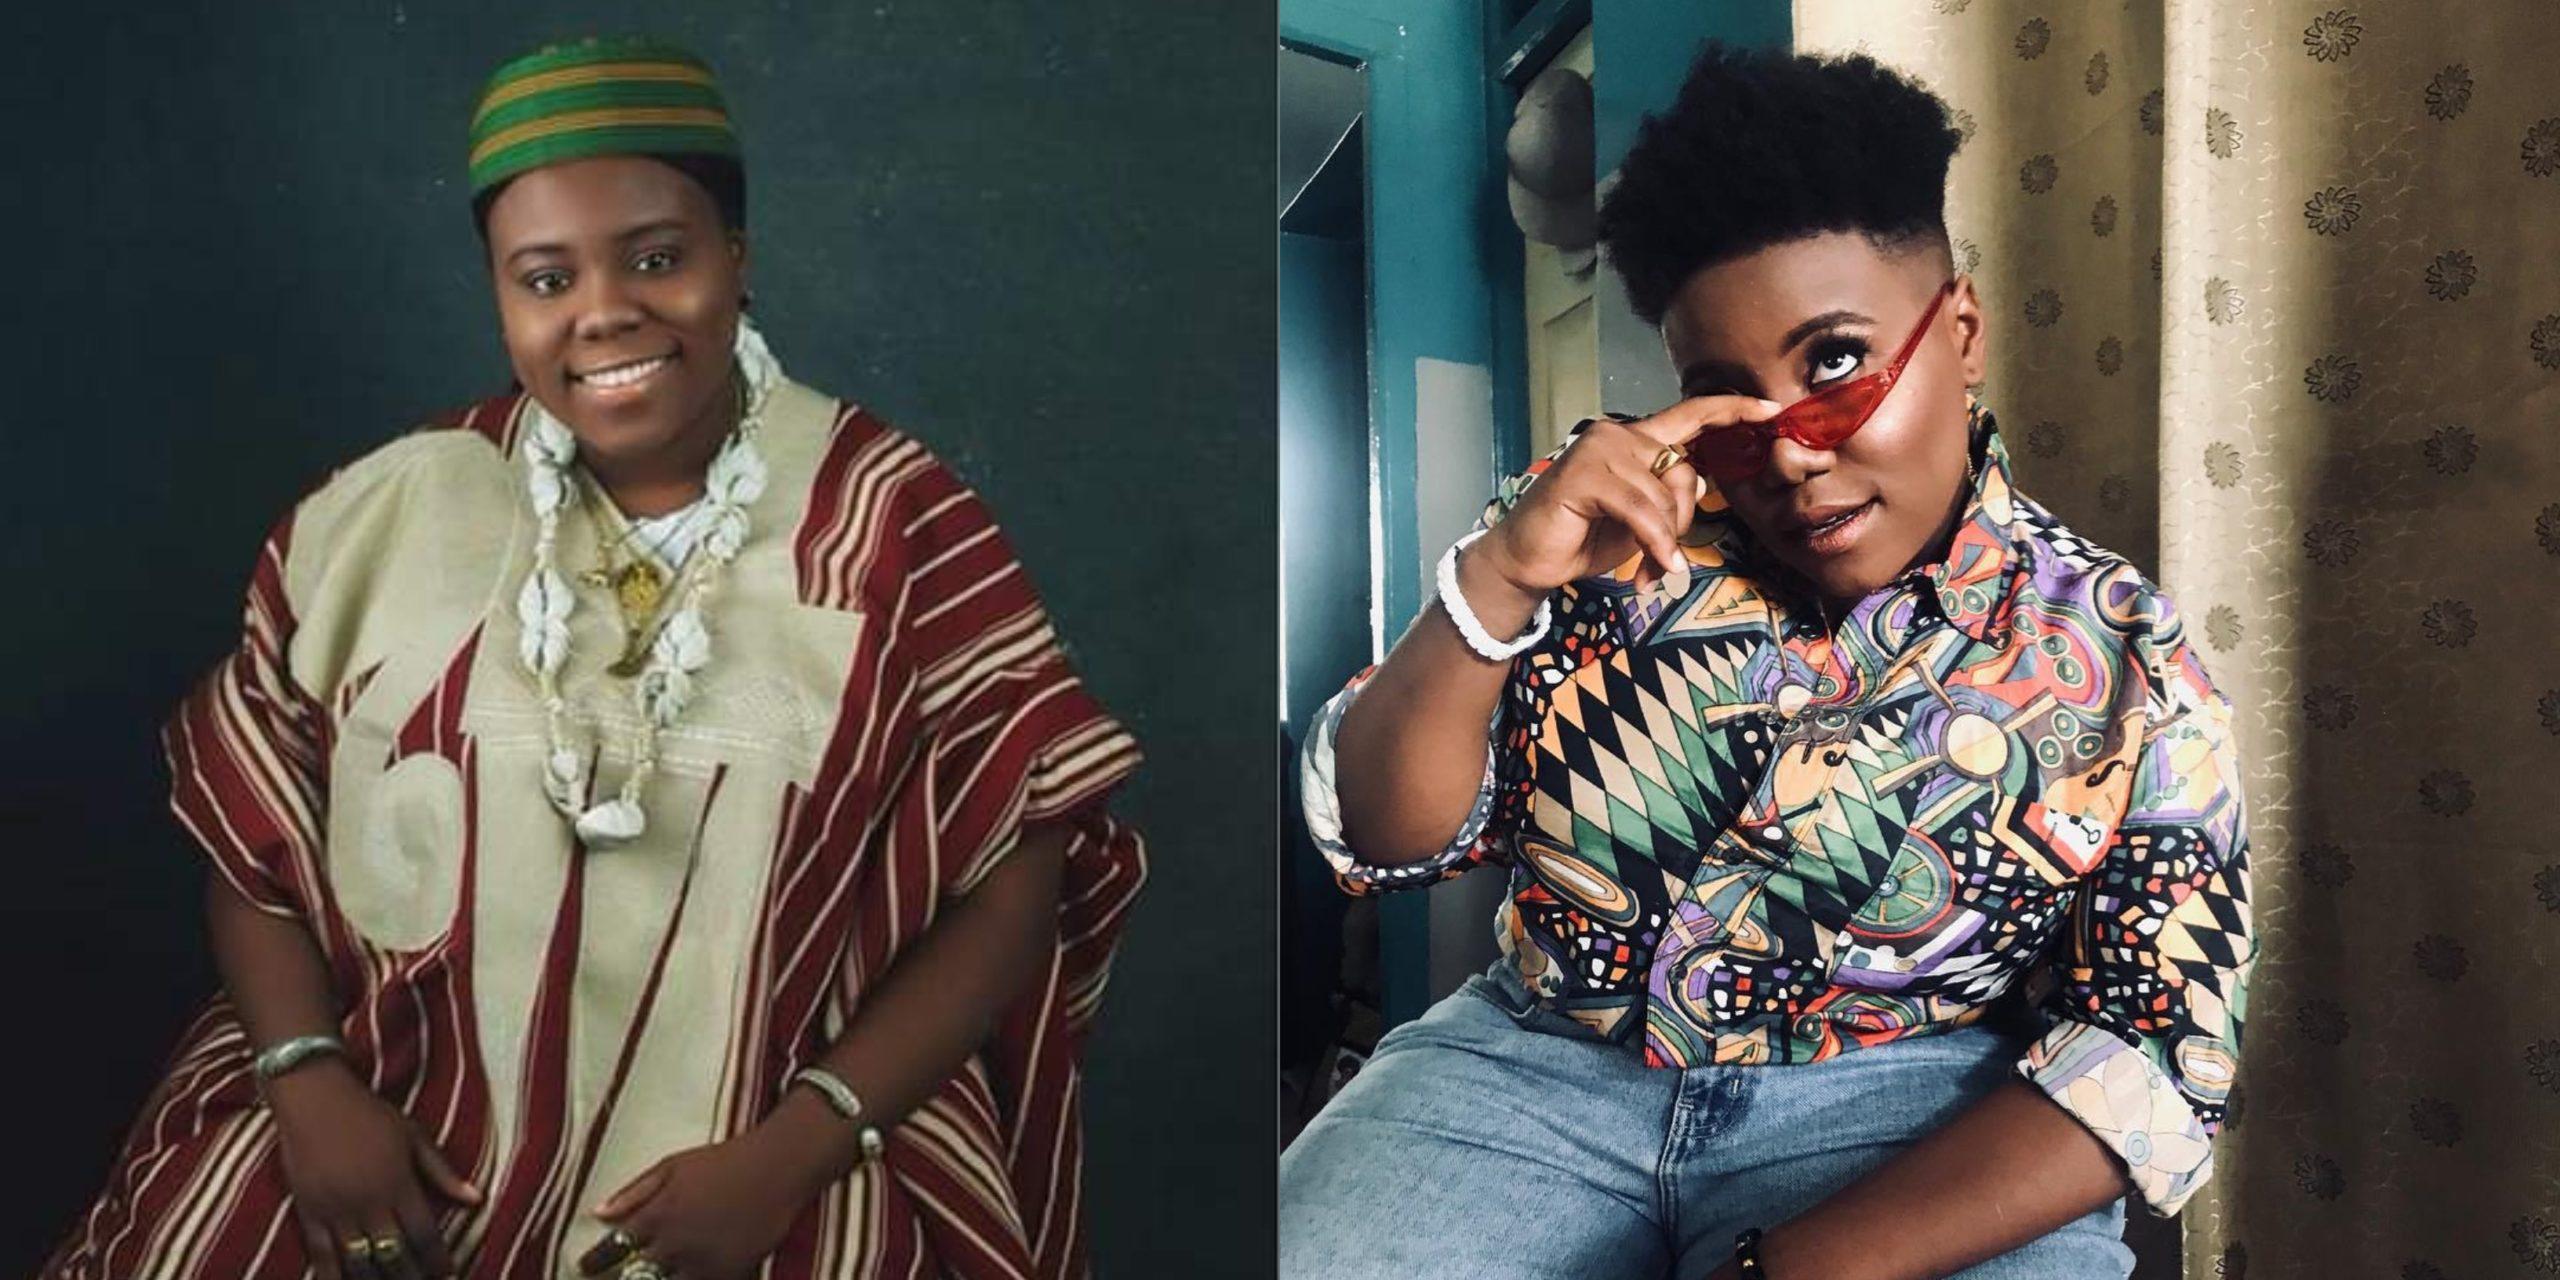 Singer, Teni the Entertainer celebrates her 27th birthday